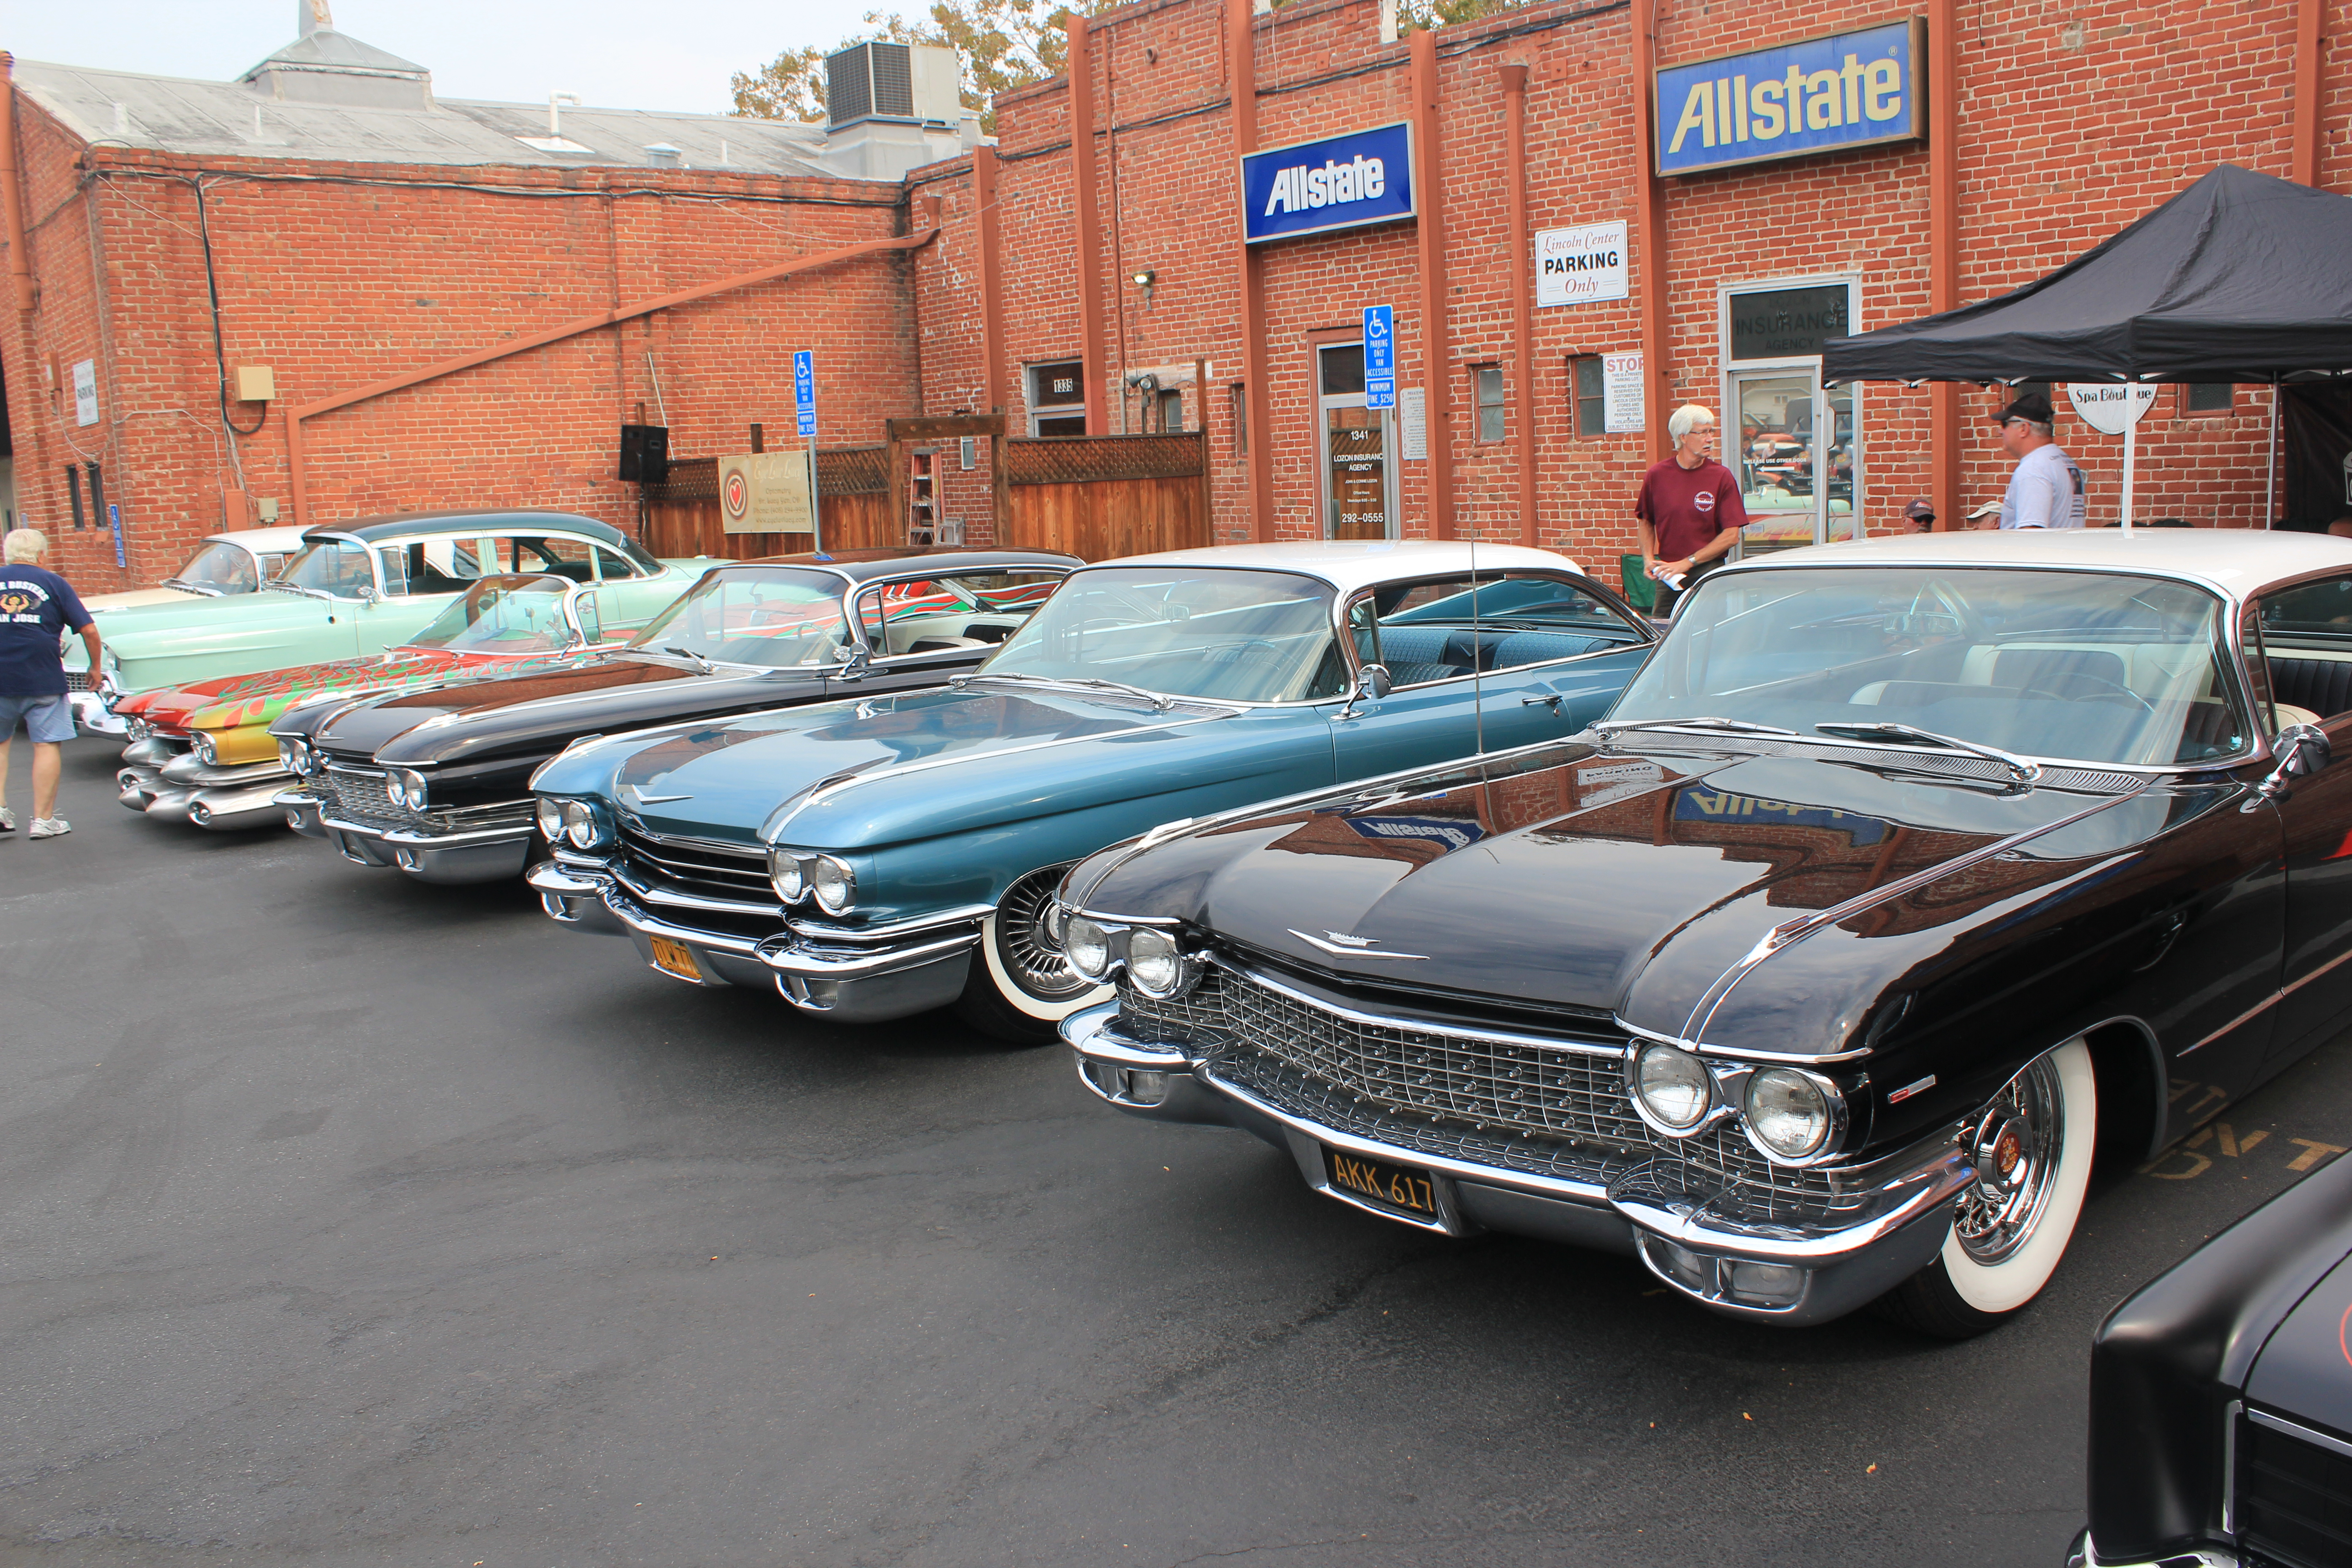 Rompacoglioni Car Show Cruise For A Cause Save Classic Cars - Cruise car show